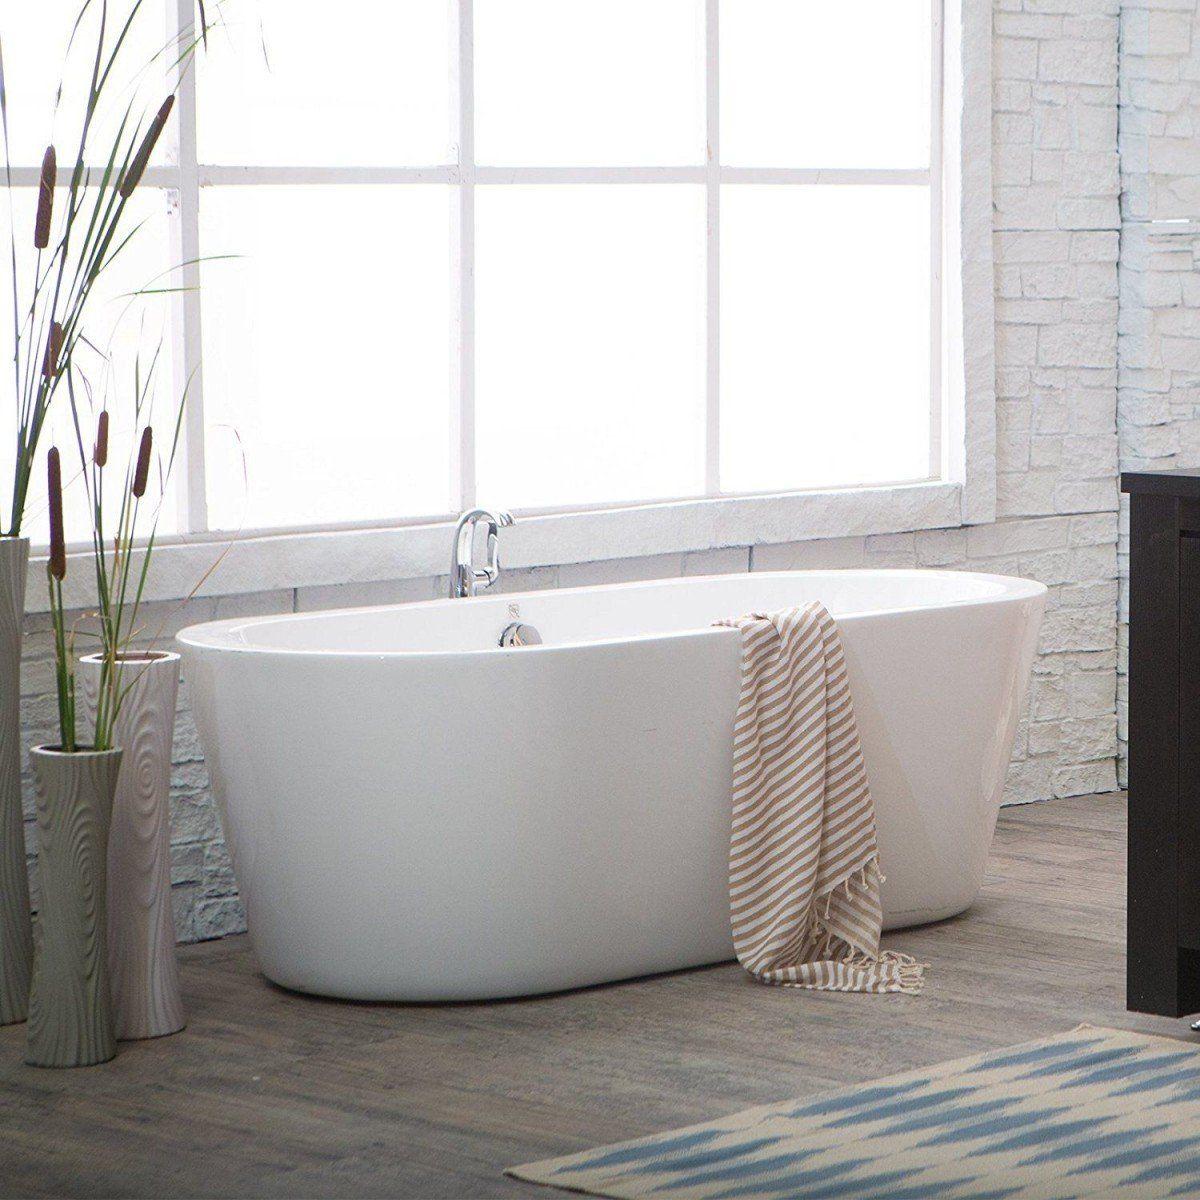 Mermaid Acrylic Double Ended Freestanding Bathtub No Faucet